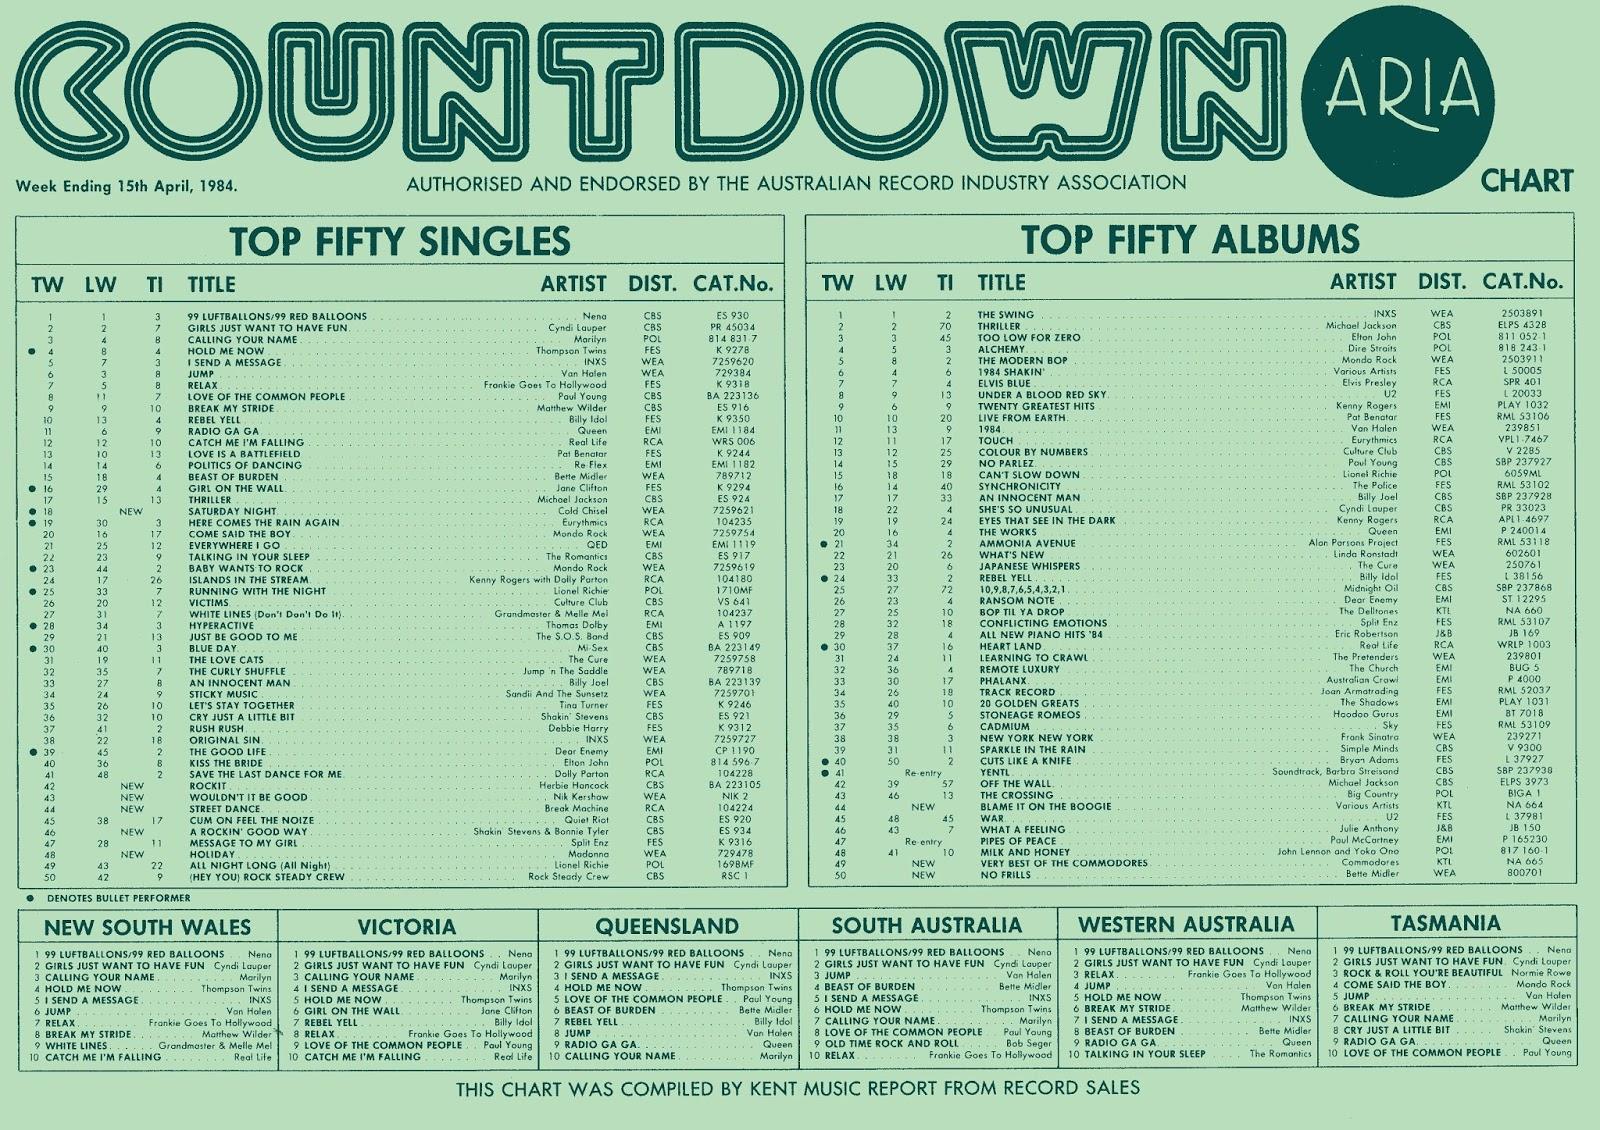 Top 15 singles chart